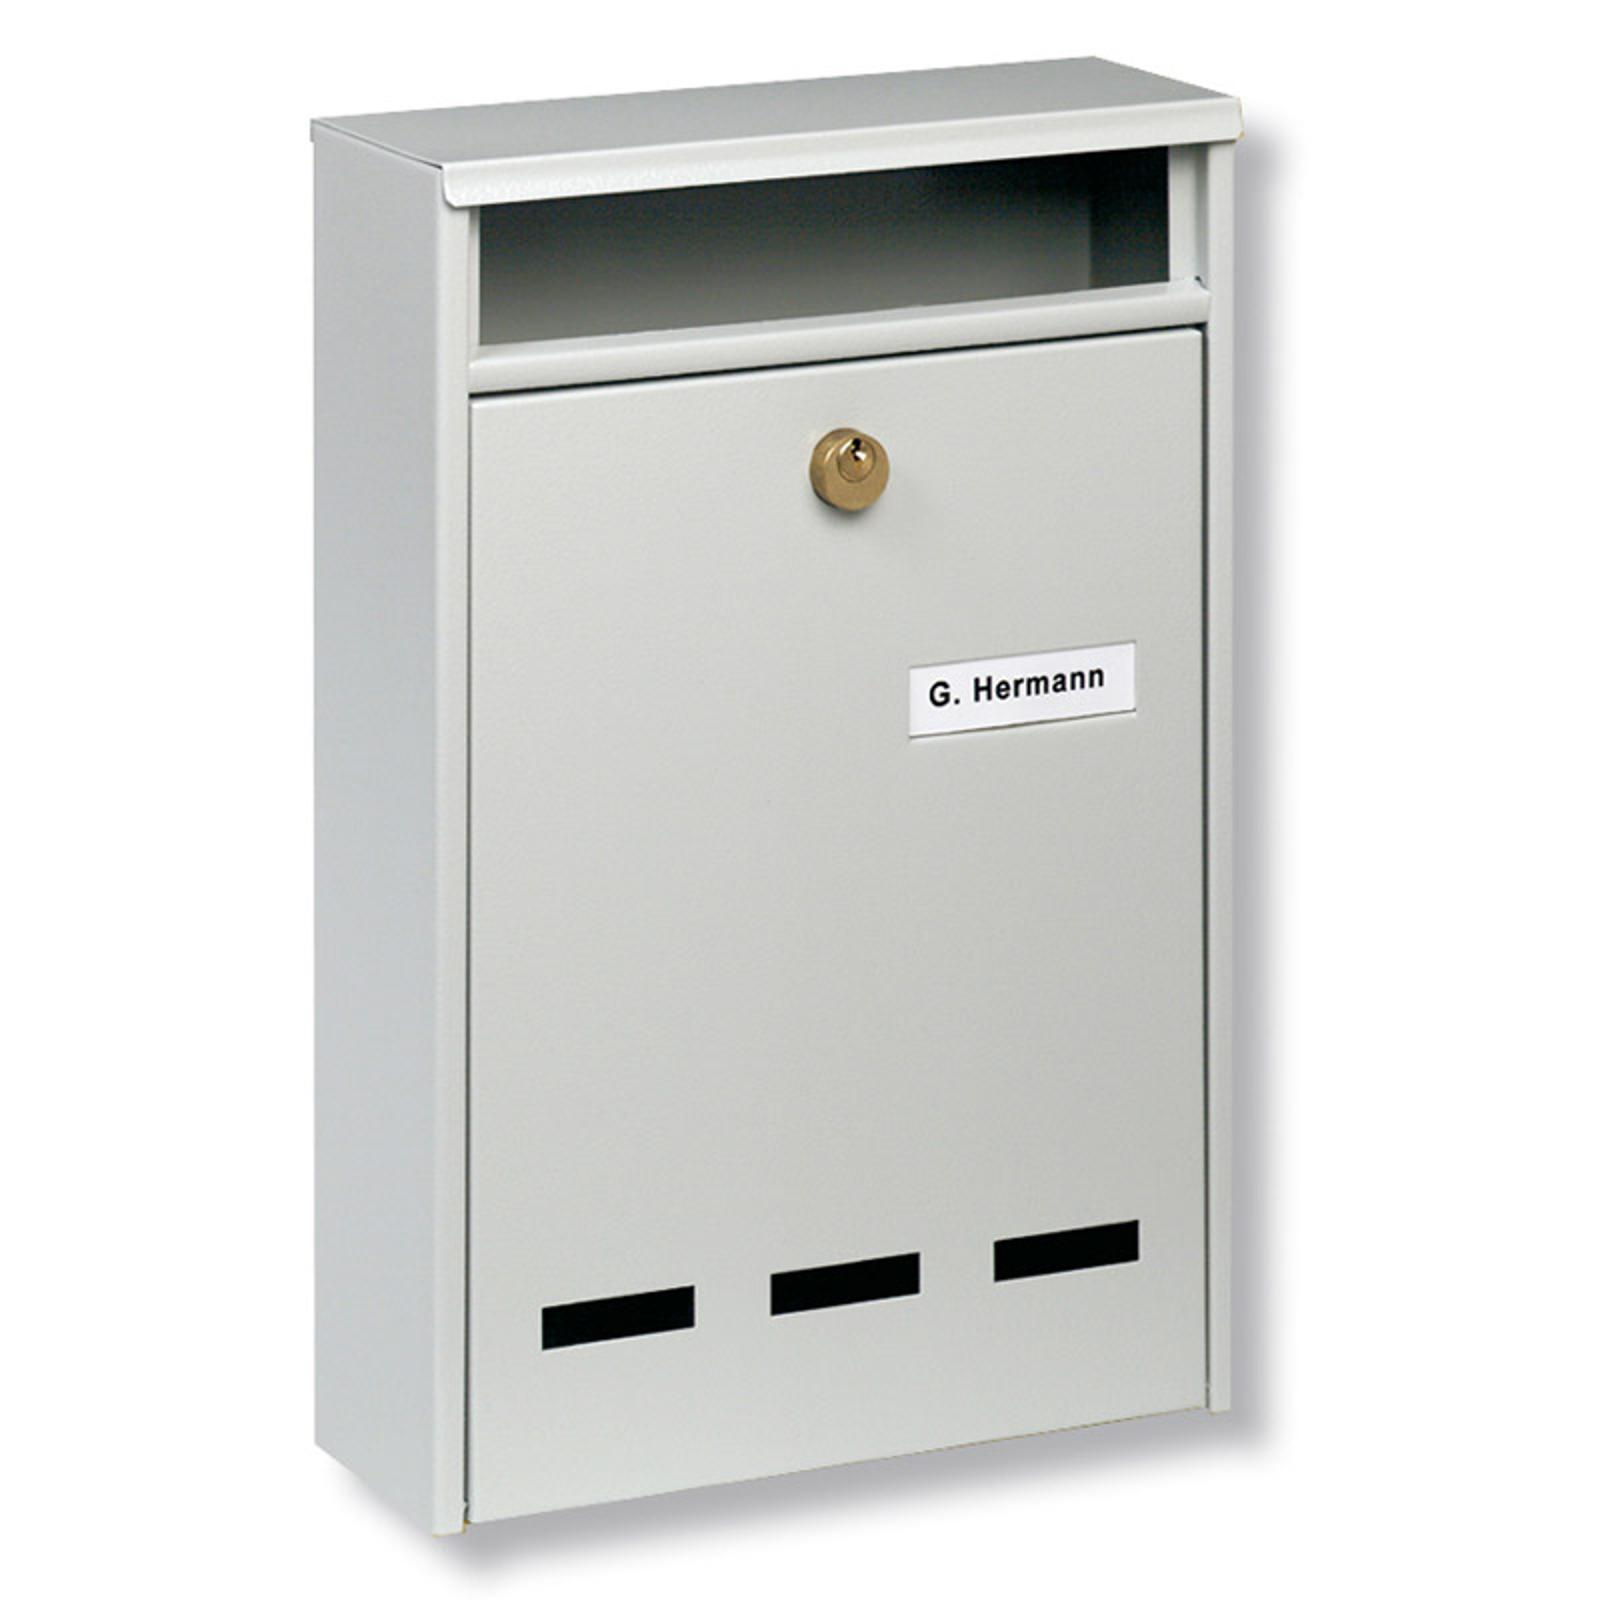 Štandardná priestorová poštová schránka WISMAR B5_1532109_1